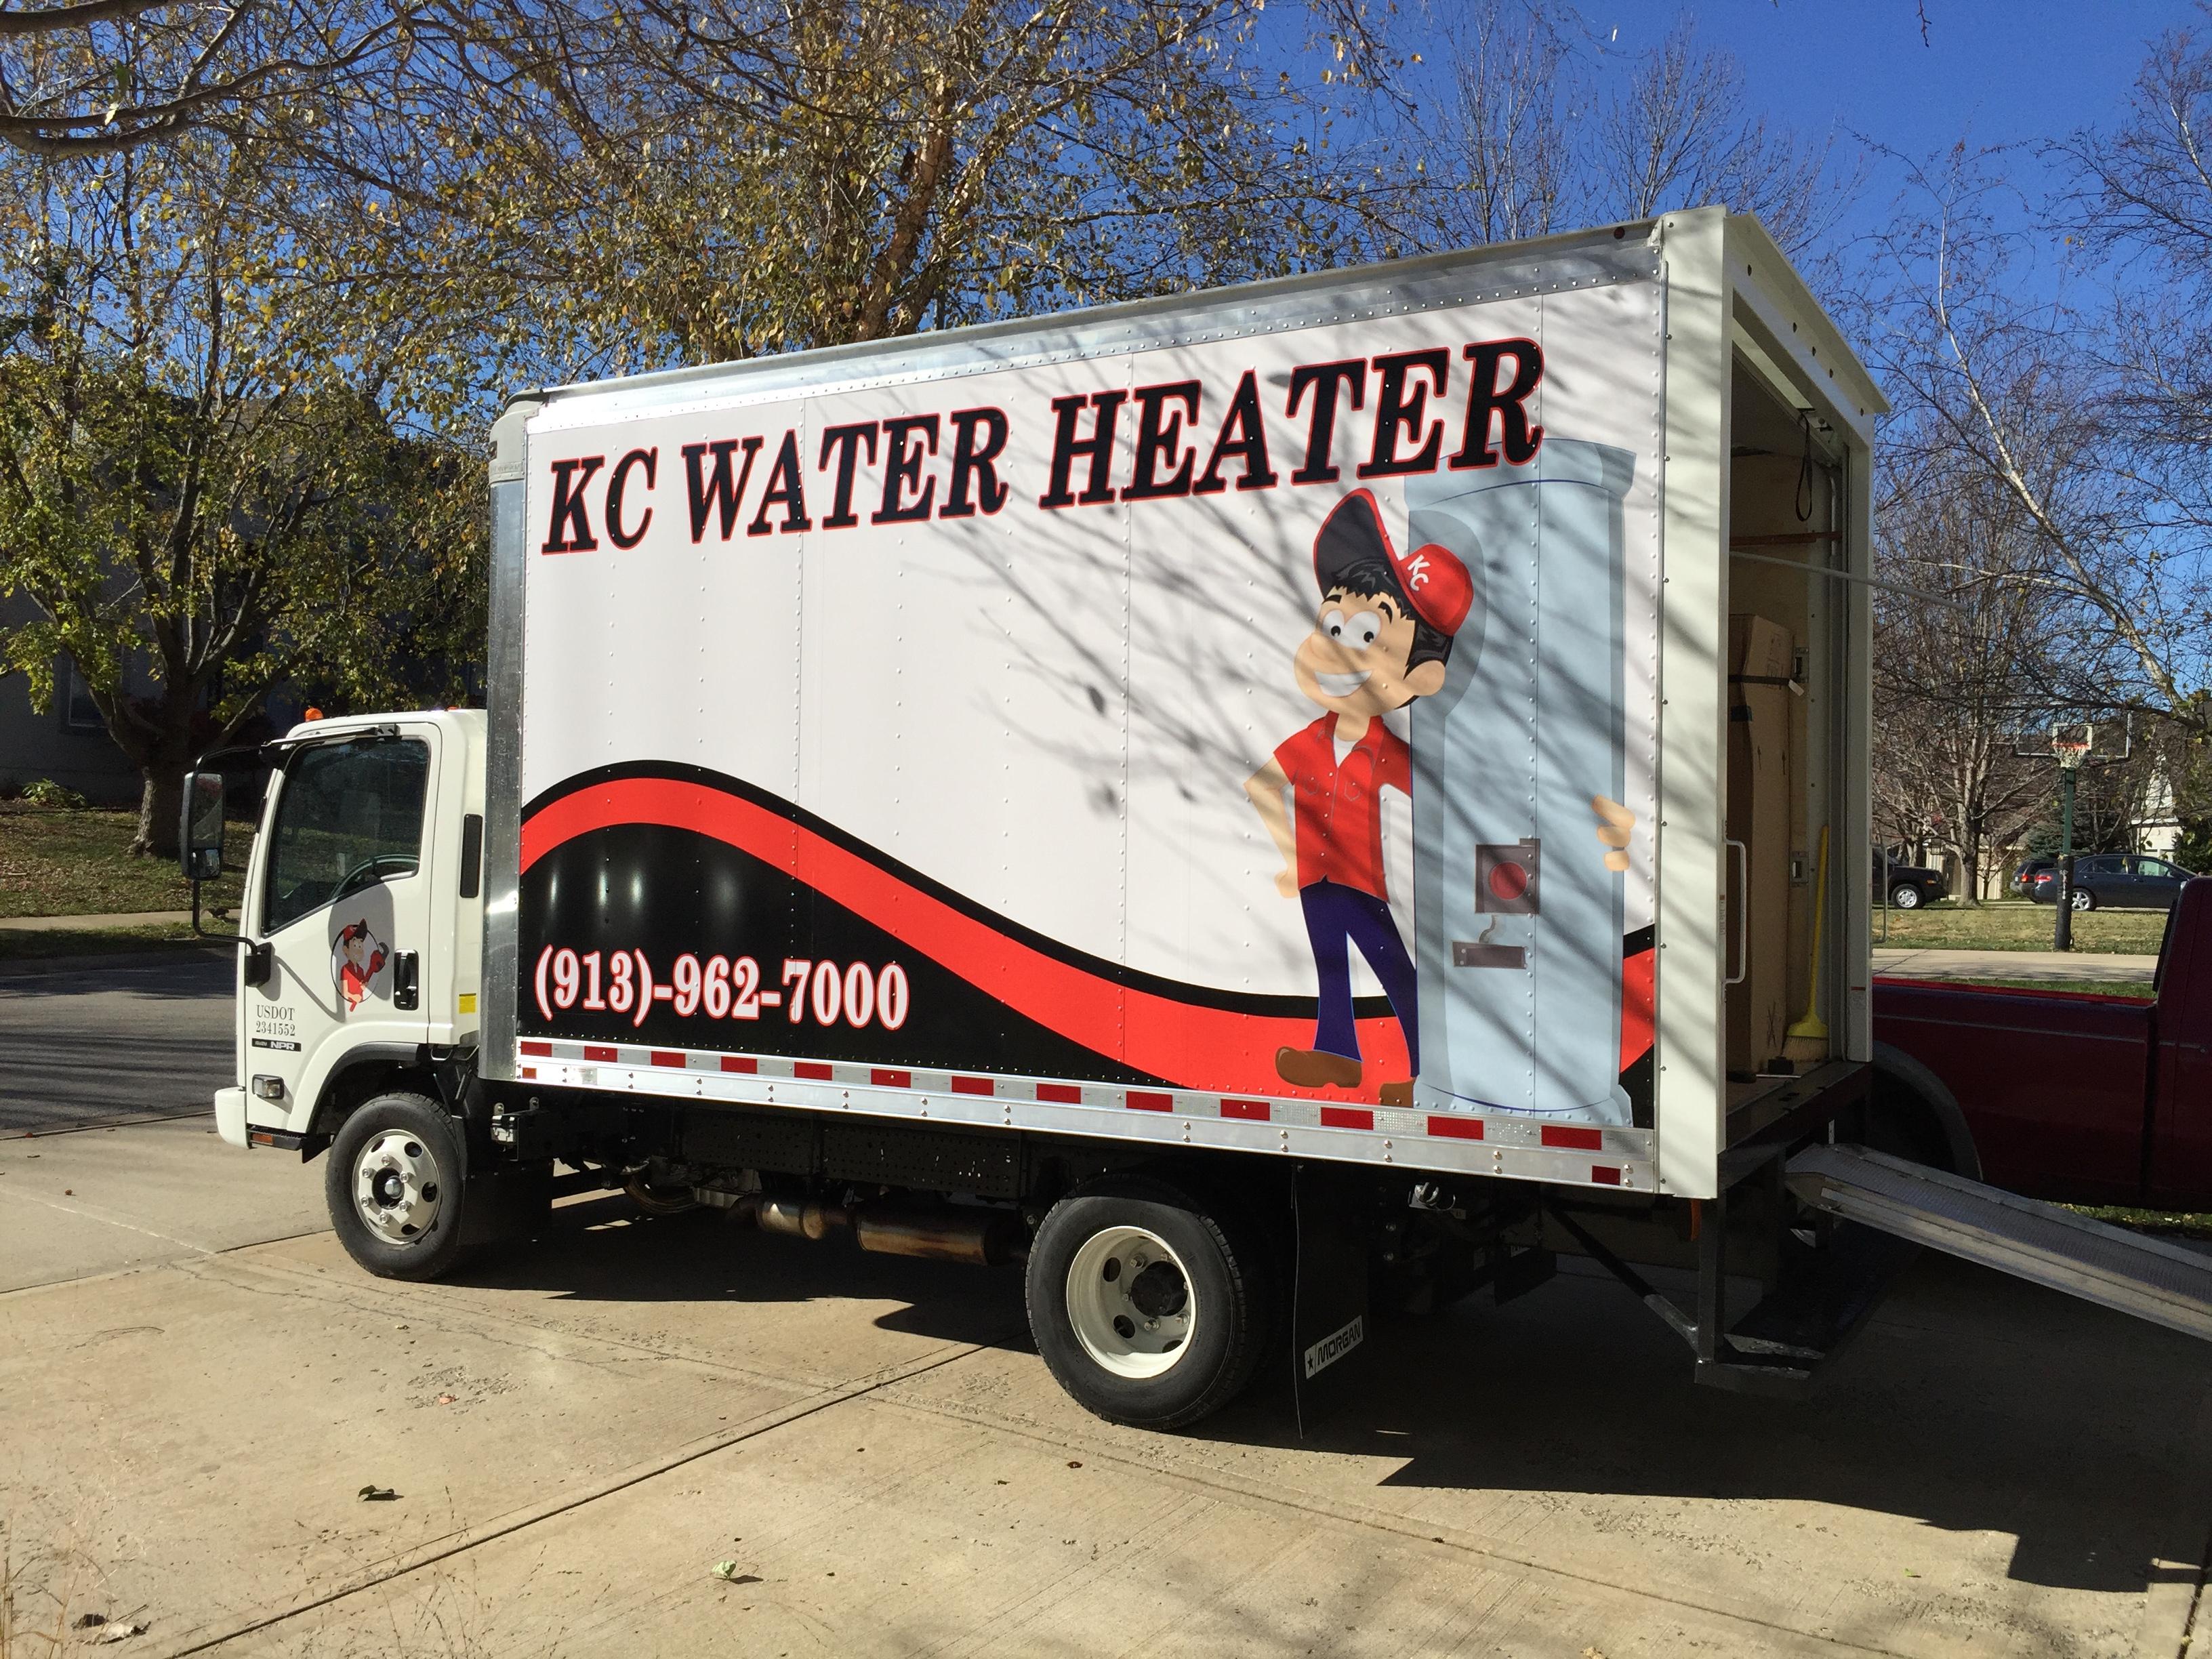 Hot water heater installer